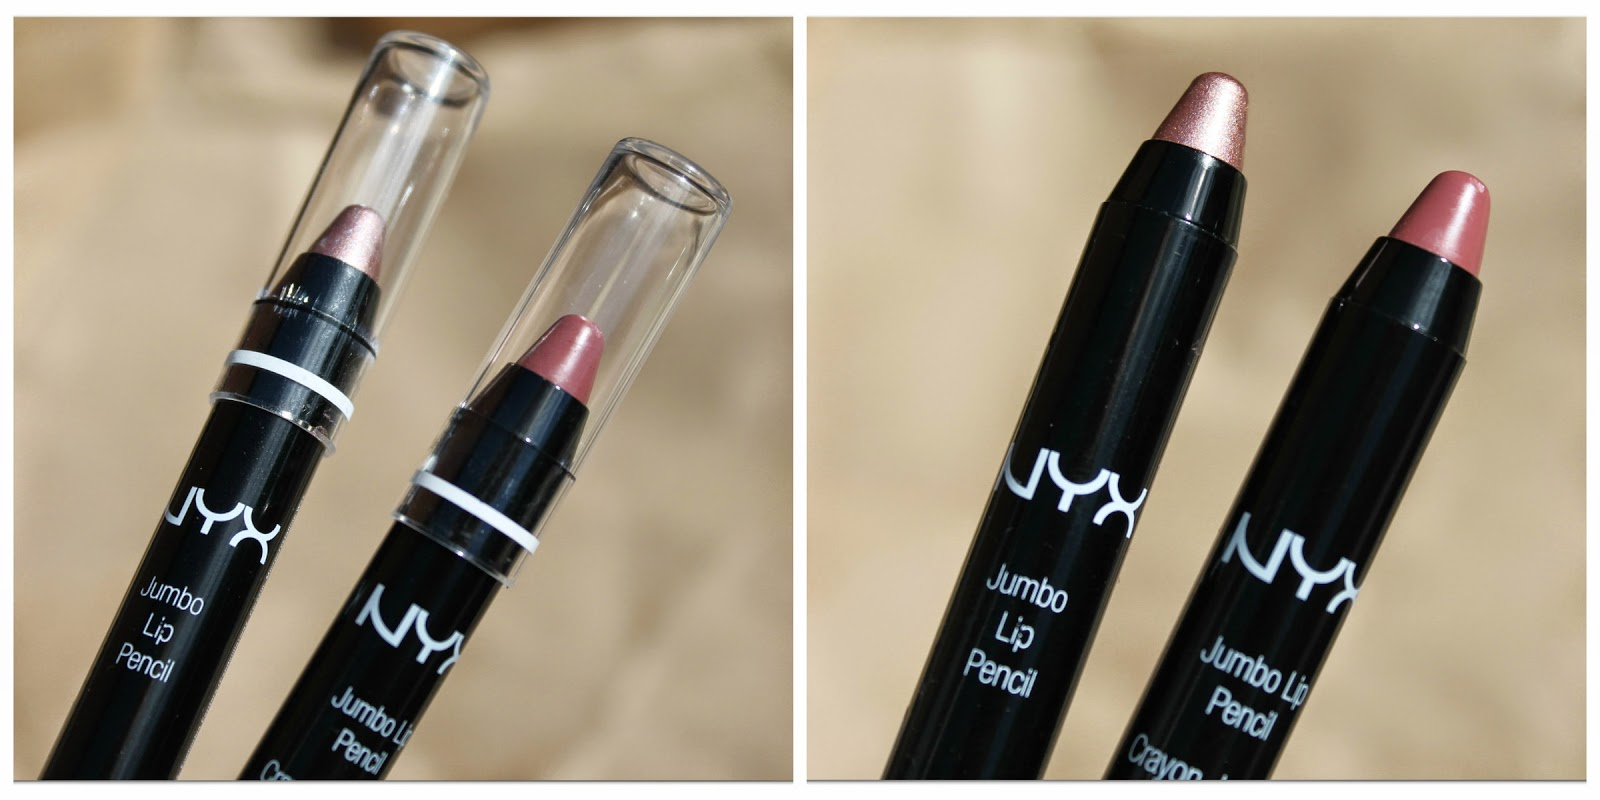 NYX Jumbo Lip Pencils